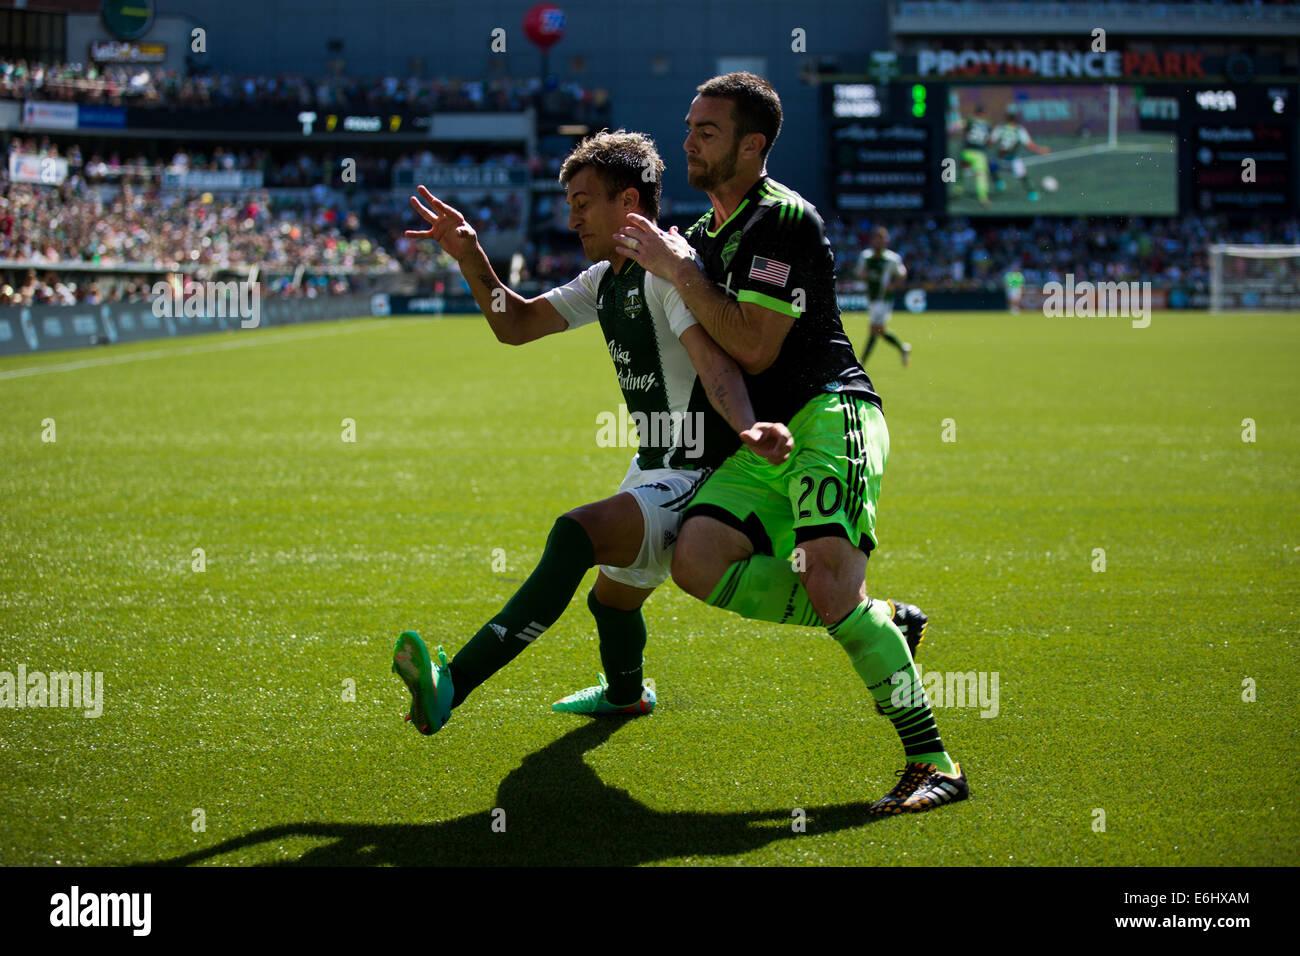 Aug. 24, 2014 - Portland's MAXIMILIANO URRUTI (37) trys to sheild against Seattle's ZACH SCOTT (20). The - Stock Image